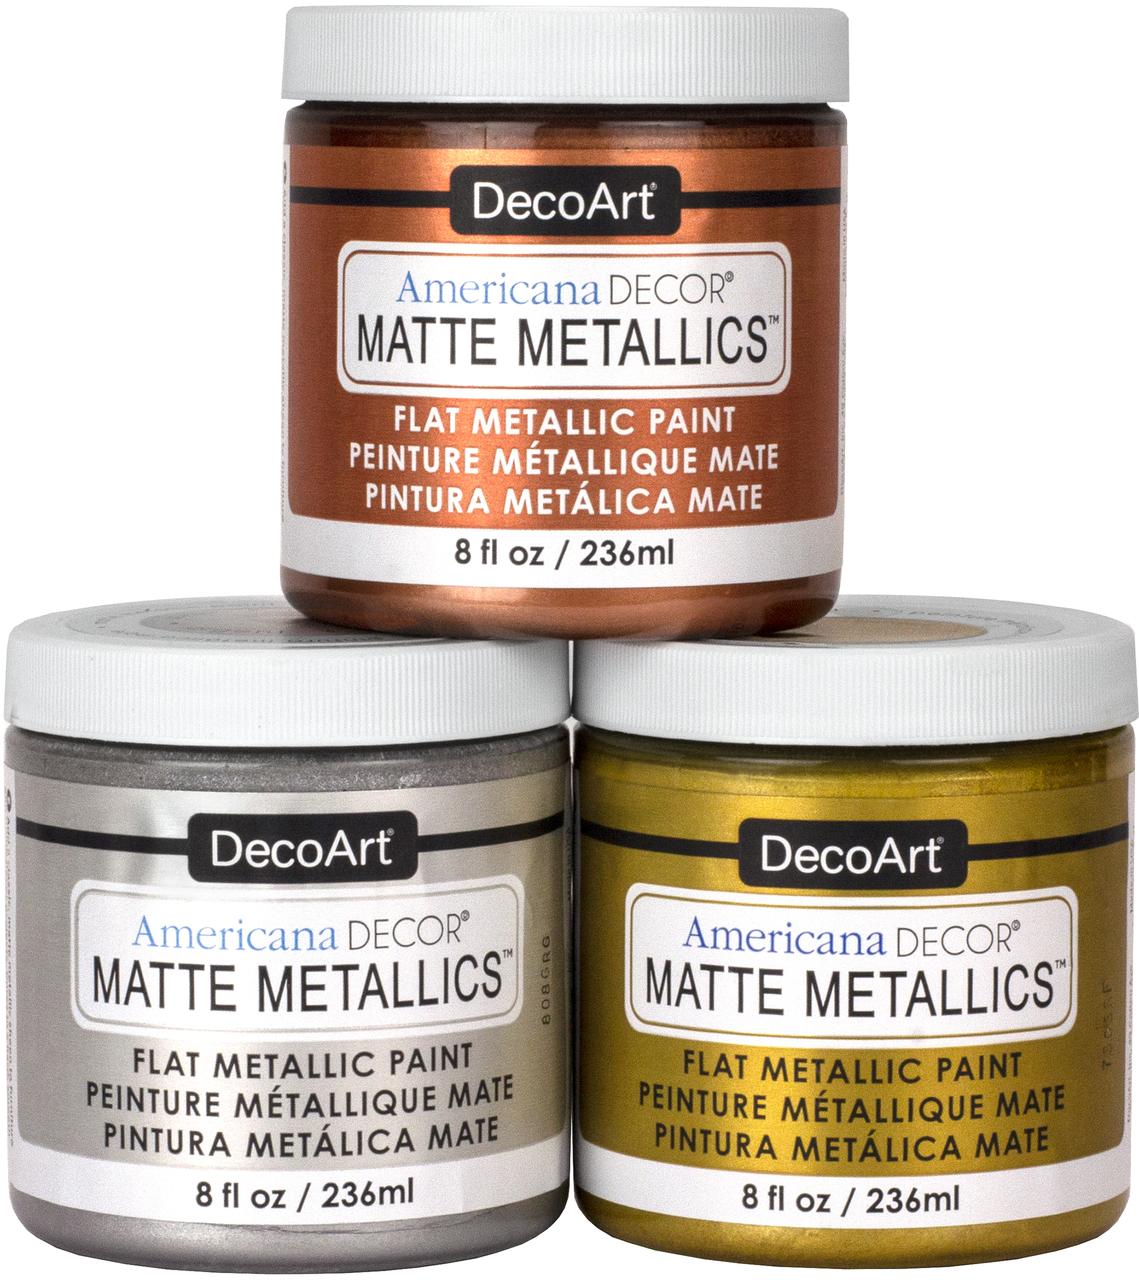 Americana Decor Matte Metallics